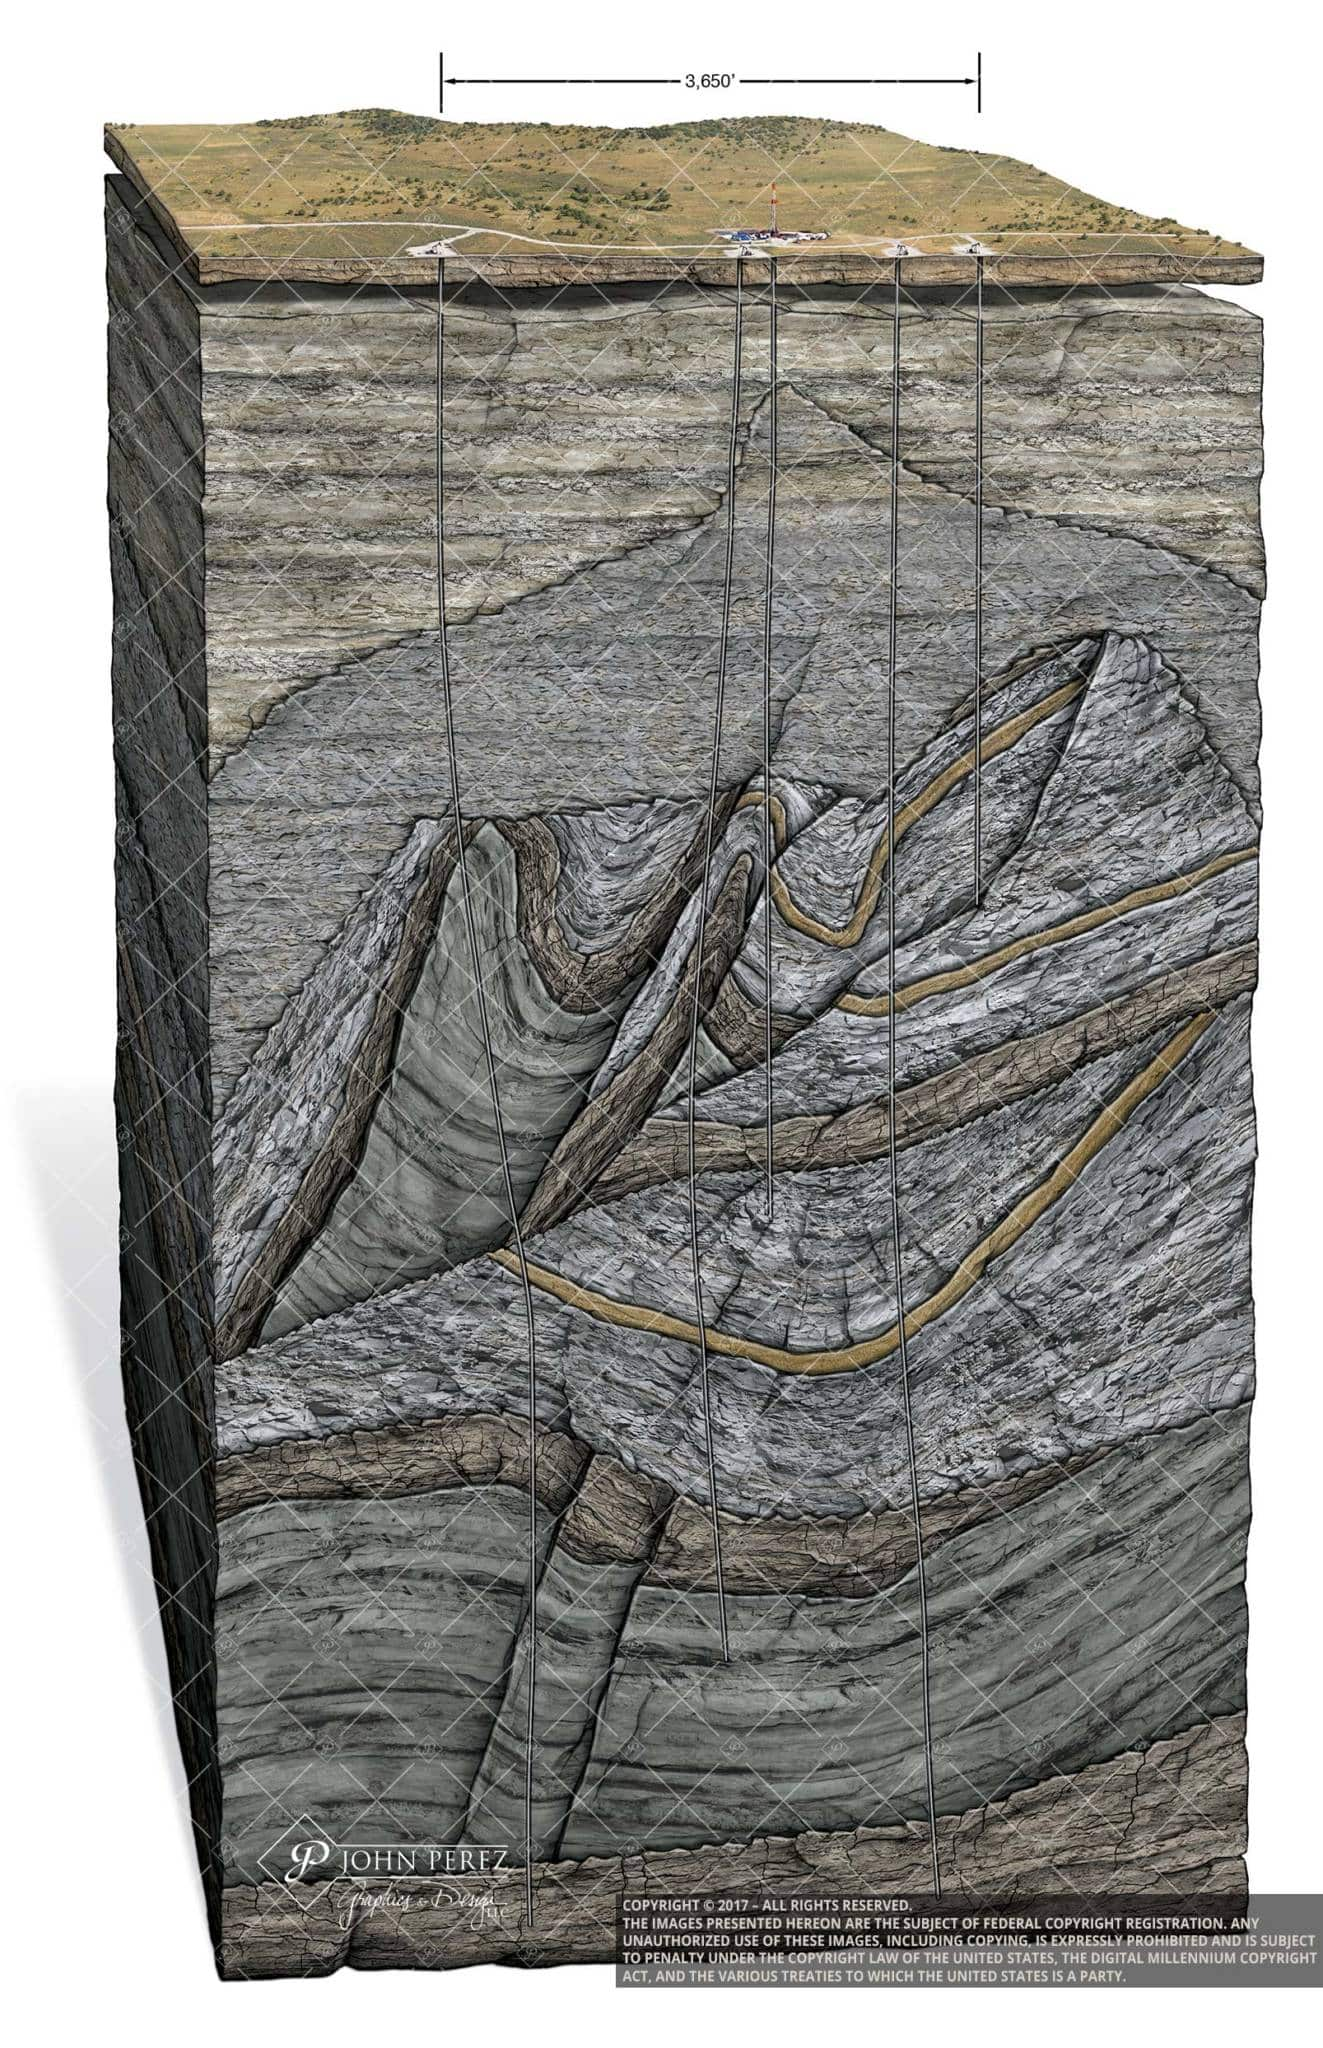 Multi Fault Vertical Drilling Oil Gas Illustration, john perez graphics, oil gas illustration, oil gas drilling, geology illustration